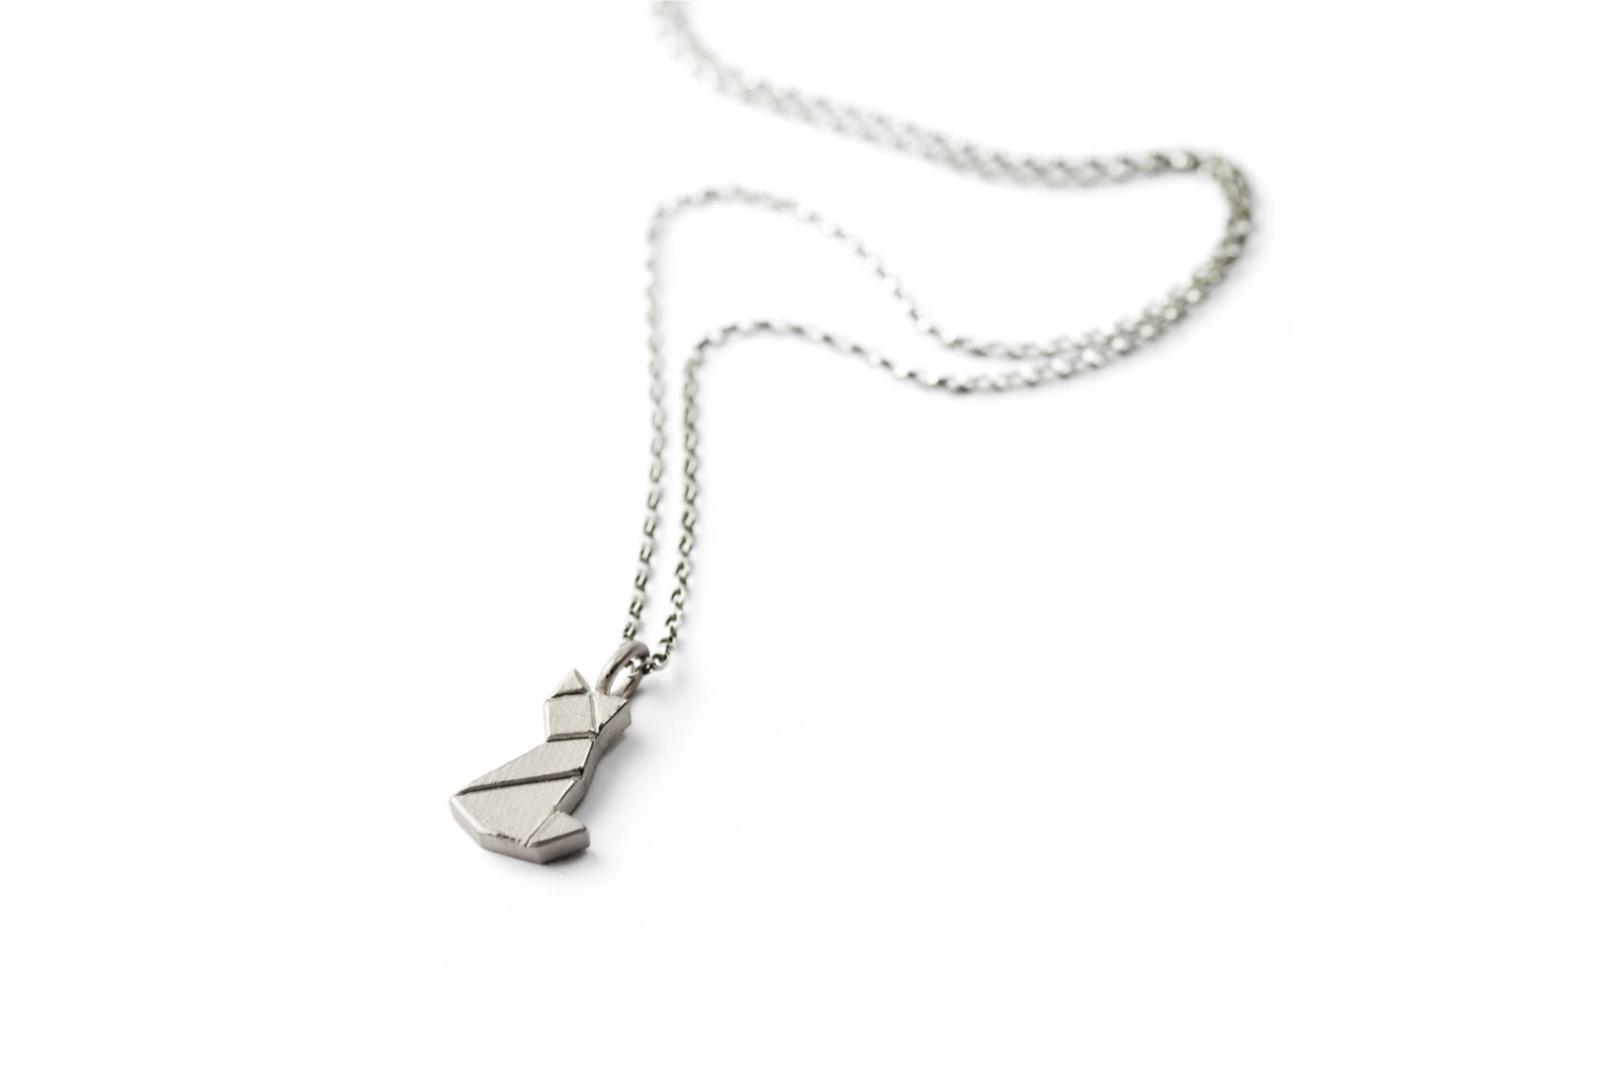 Tangram Kette MIEZE 935 Silber